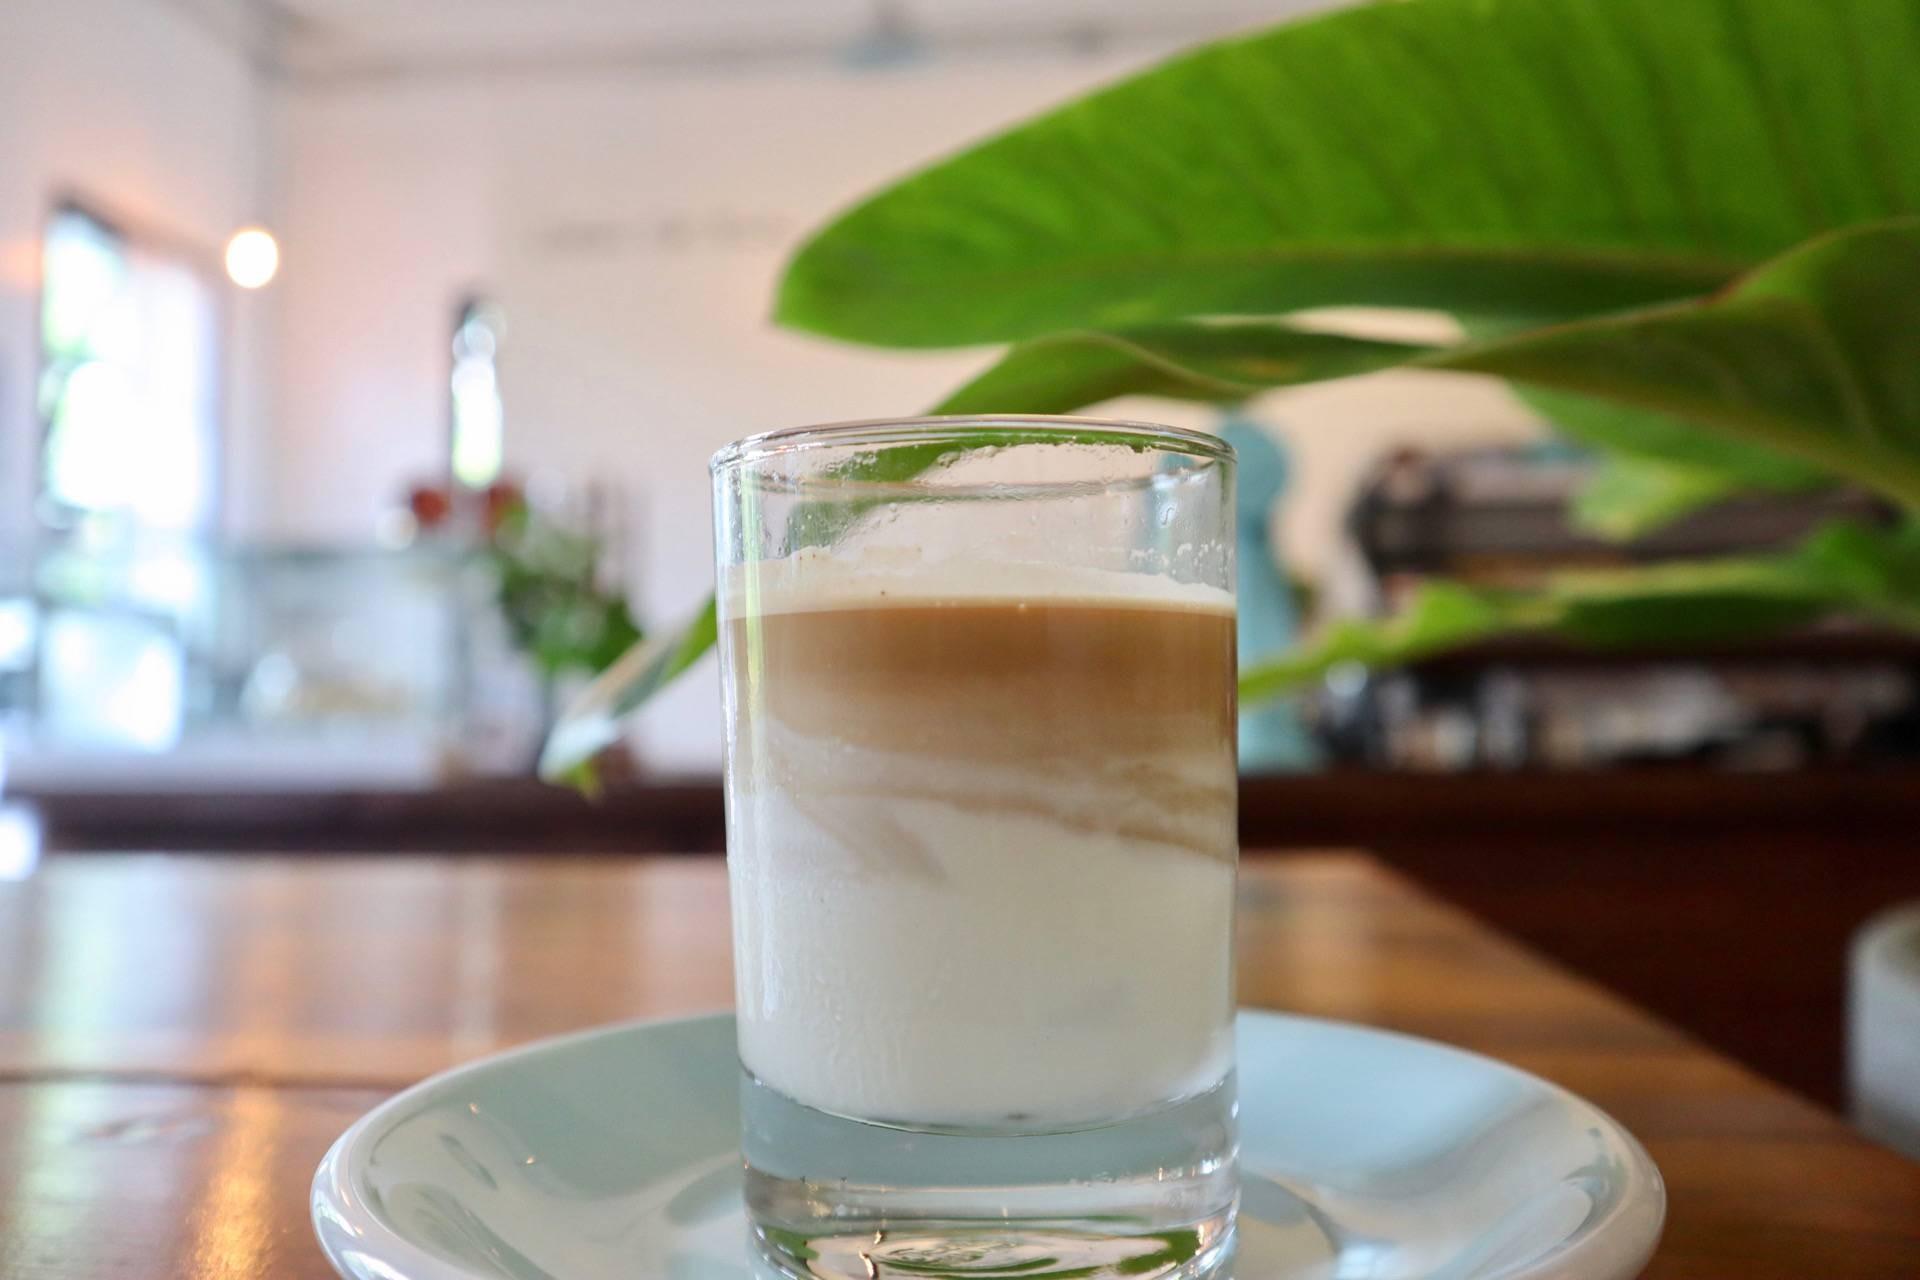 Cottontree Coffee Roasters